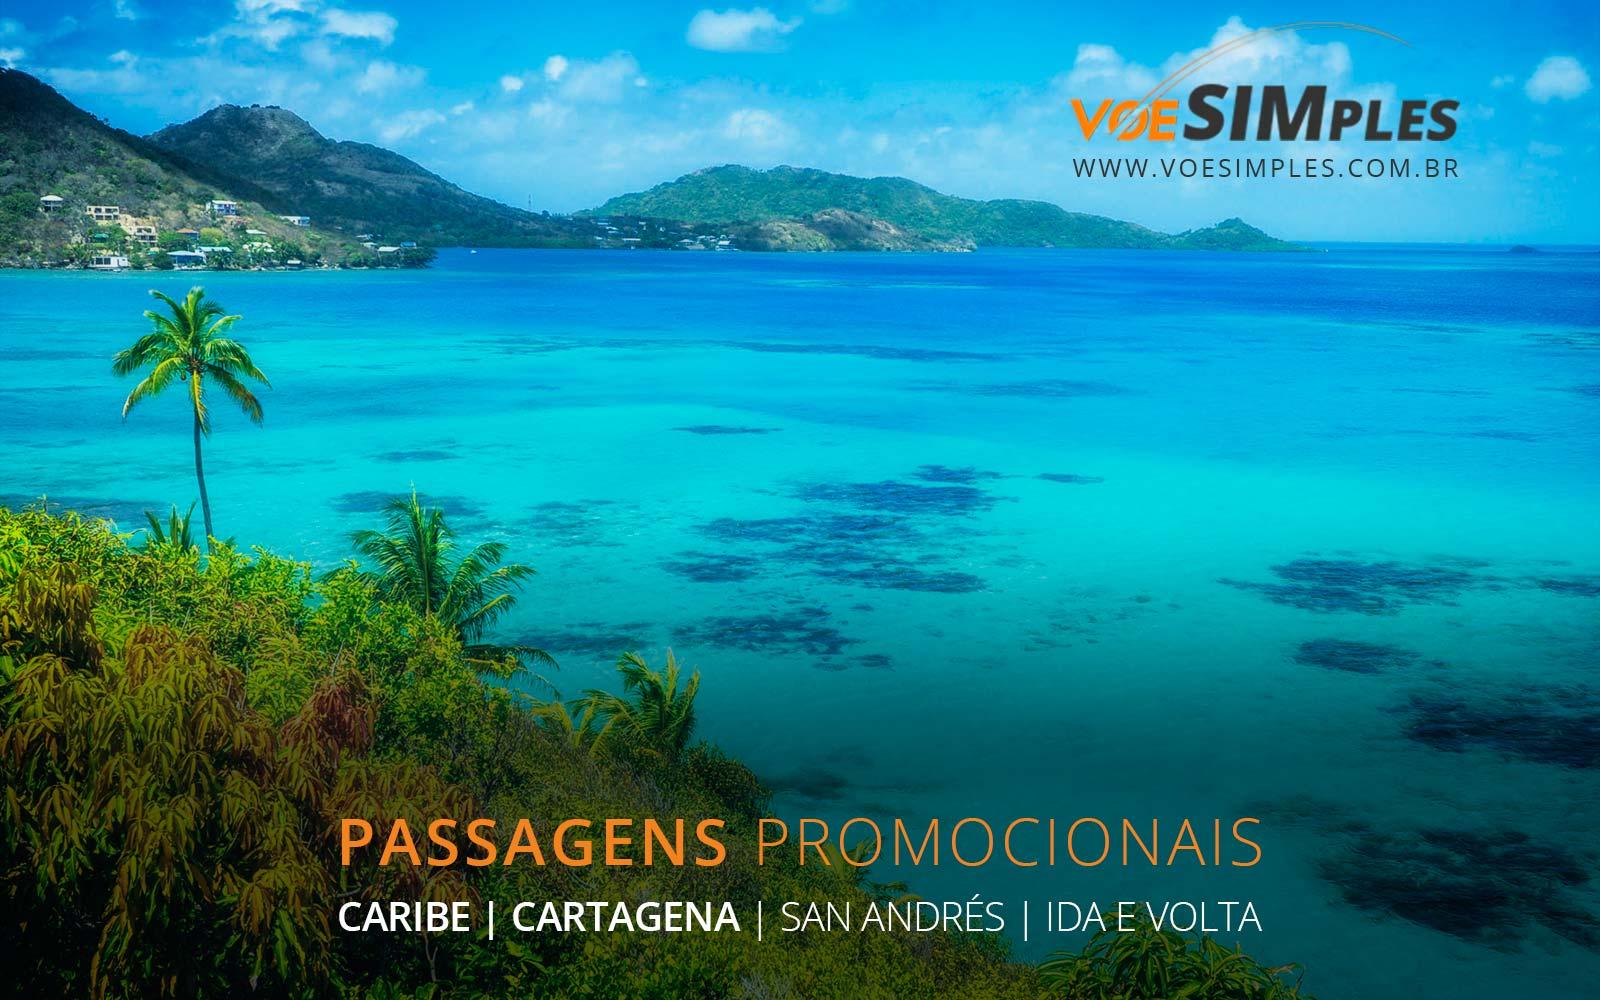 Passagens aéreas baratas para Cartagena e San Andrés no Caribe Colombiano.